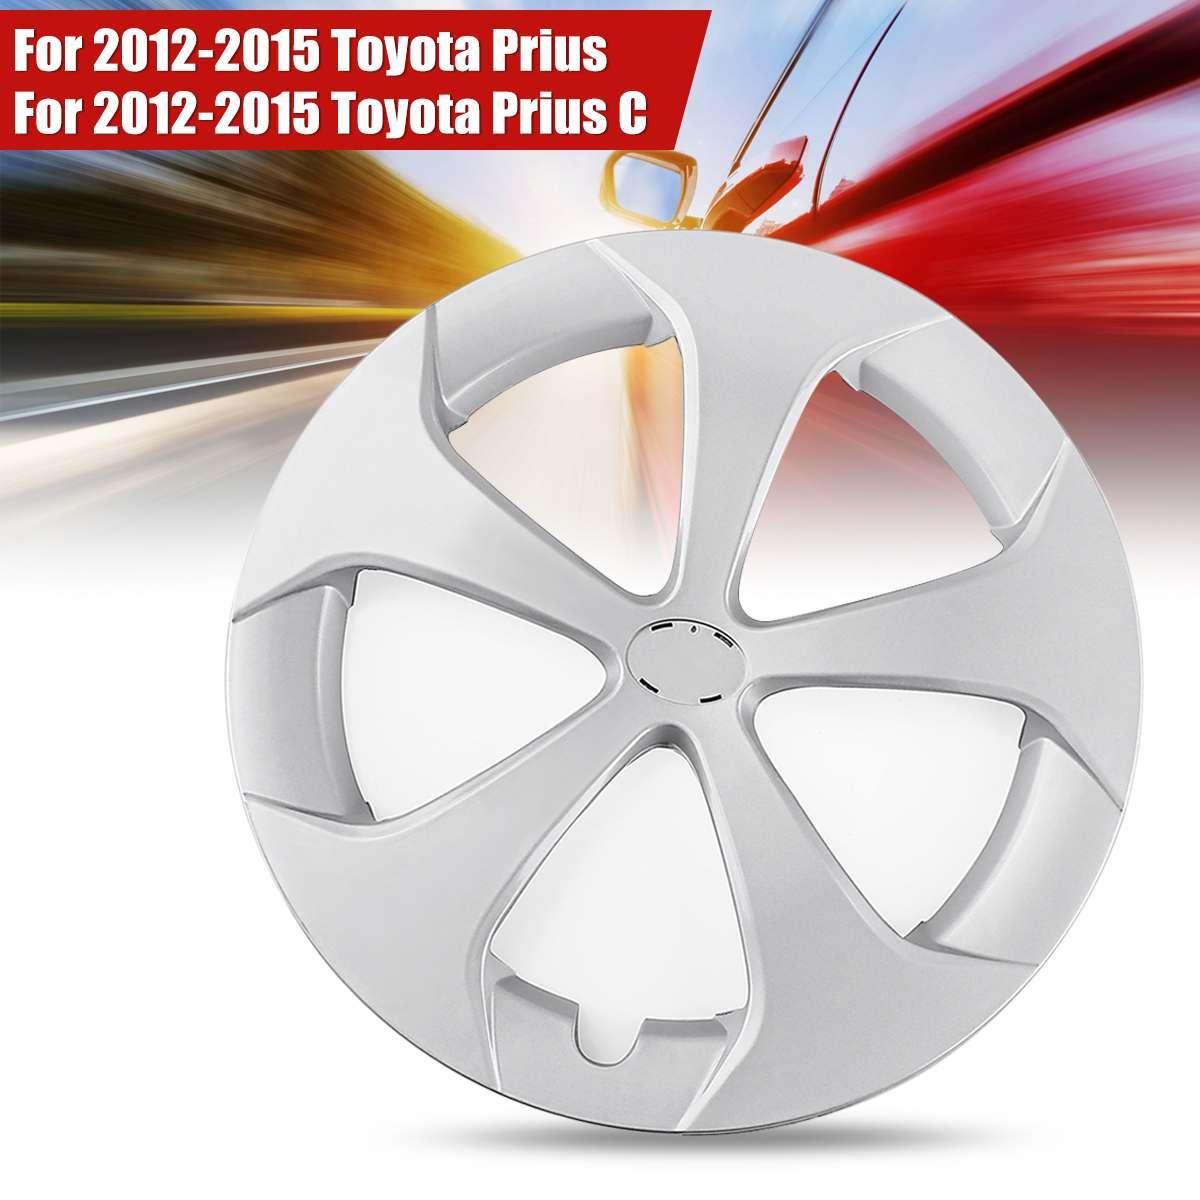 FOR TOYOTA PRIUS WHEEL COVERS SET OF 4 WHEEL TRIMS PRIUS WHEEL HUB CAP 2012-2015